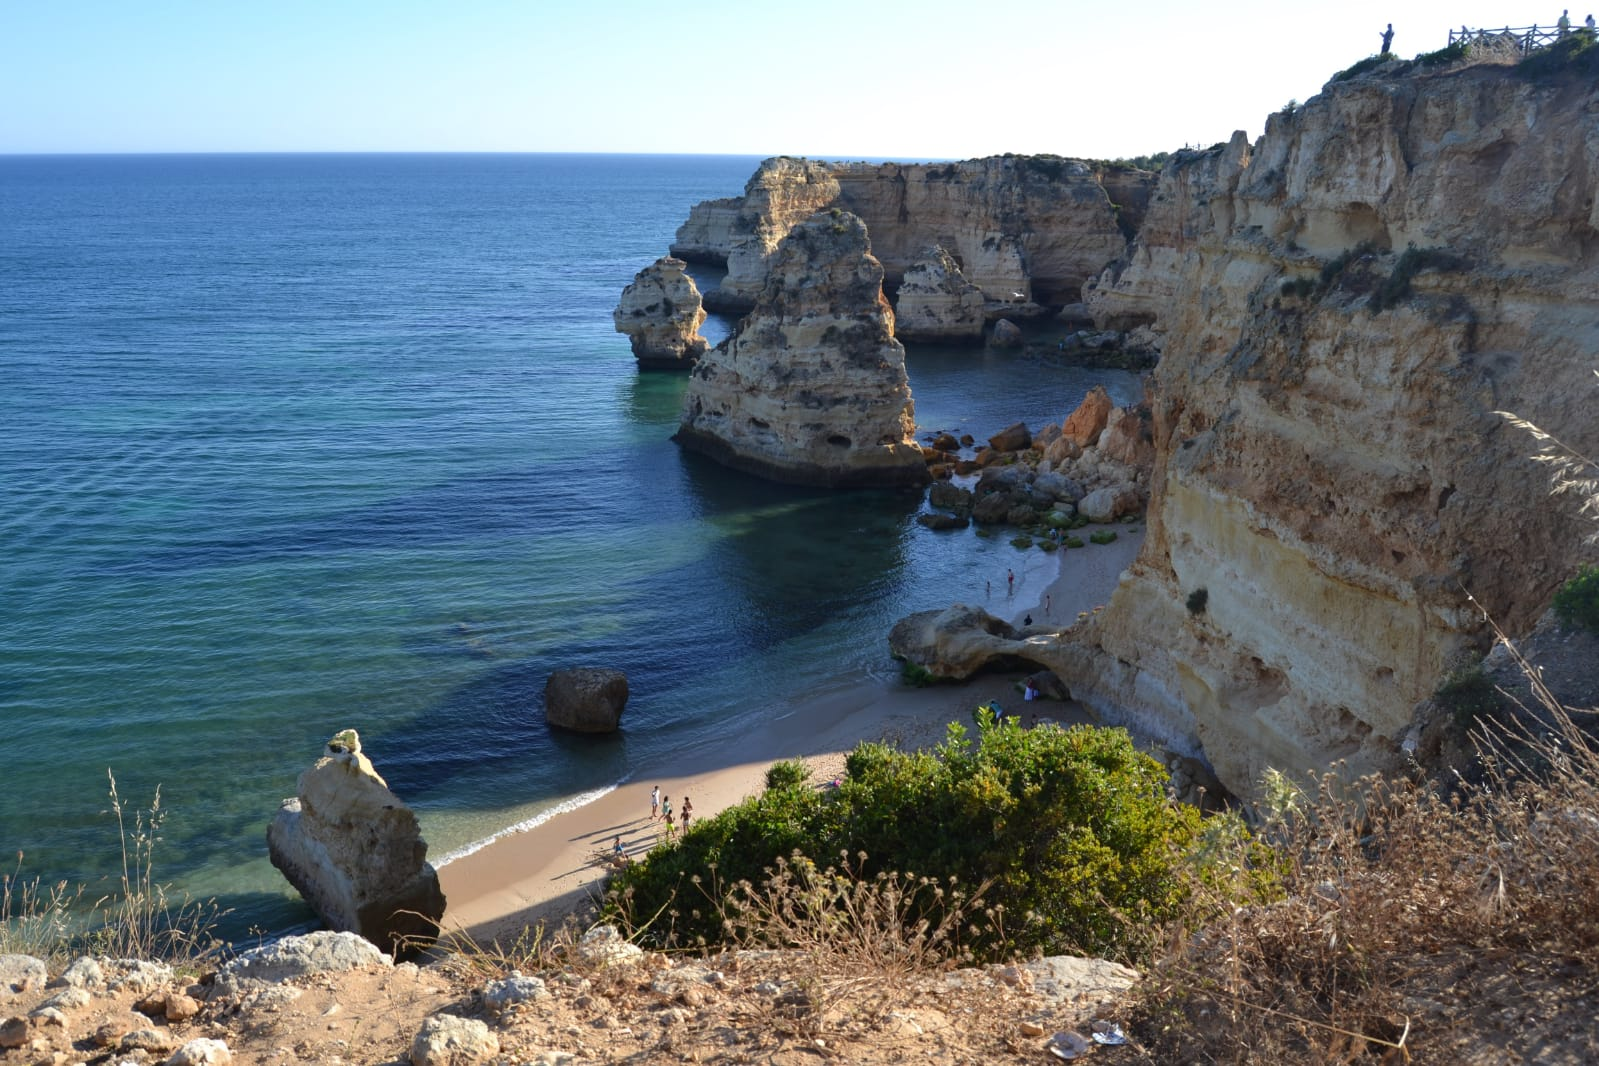 visiter-portima-algarve-portugal-plages-falaise-portugal-tourisme